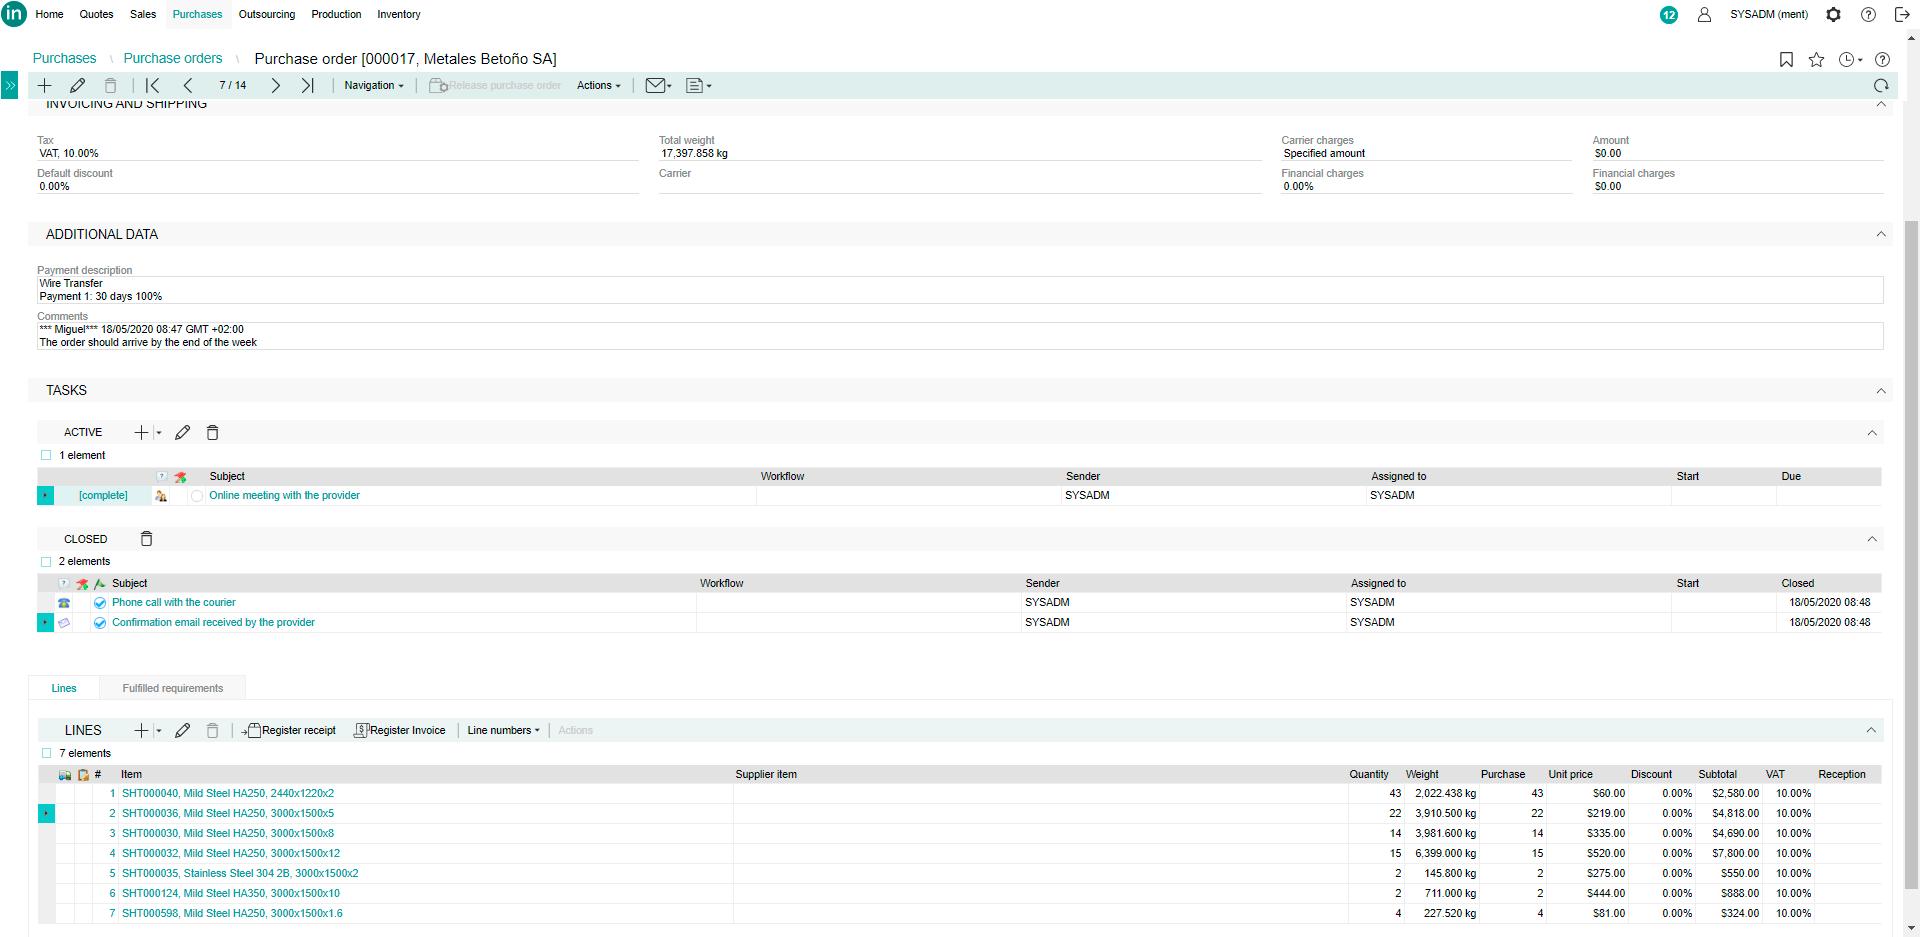 Lantek Integra Purchases  - 采购订单